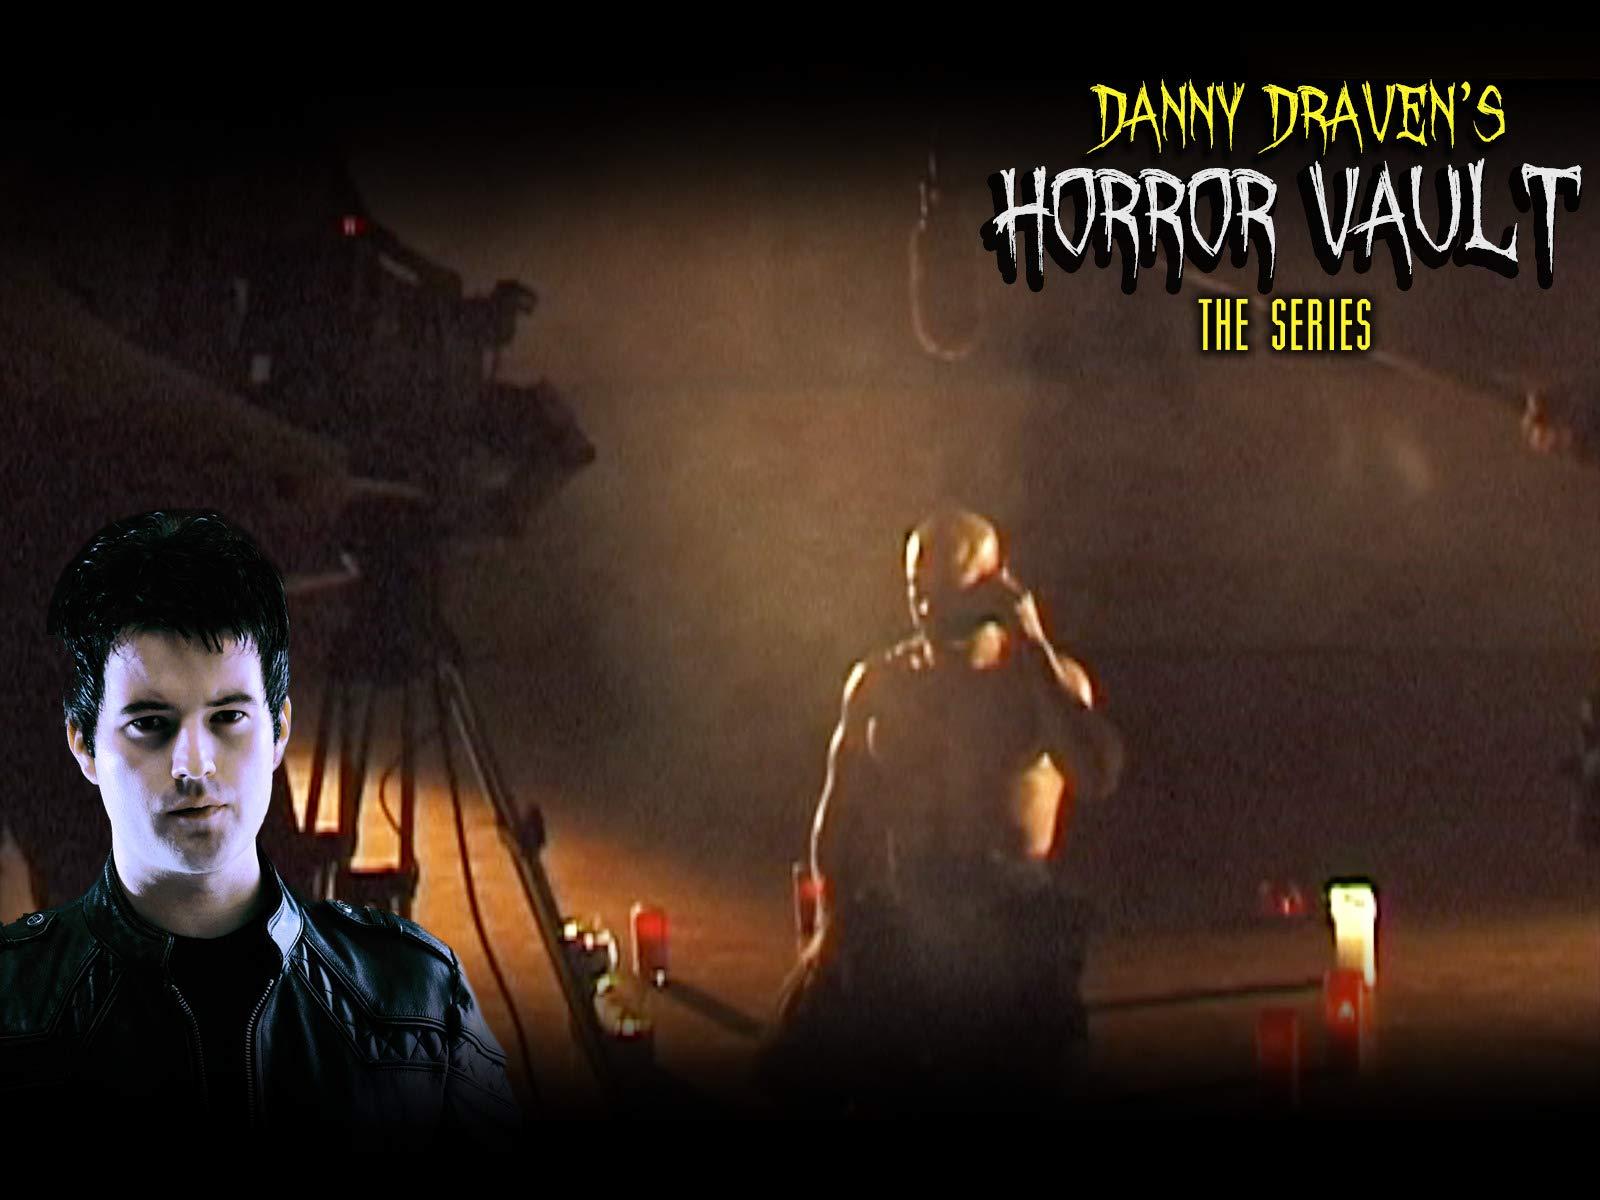 Danny Draven's Horror Vault: The Series - Season 1